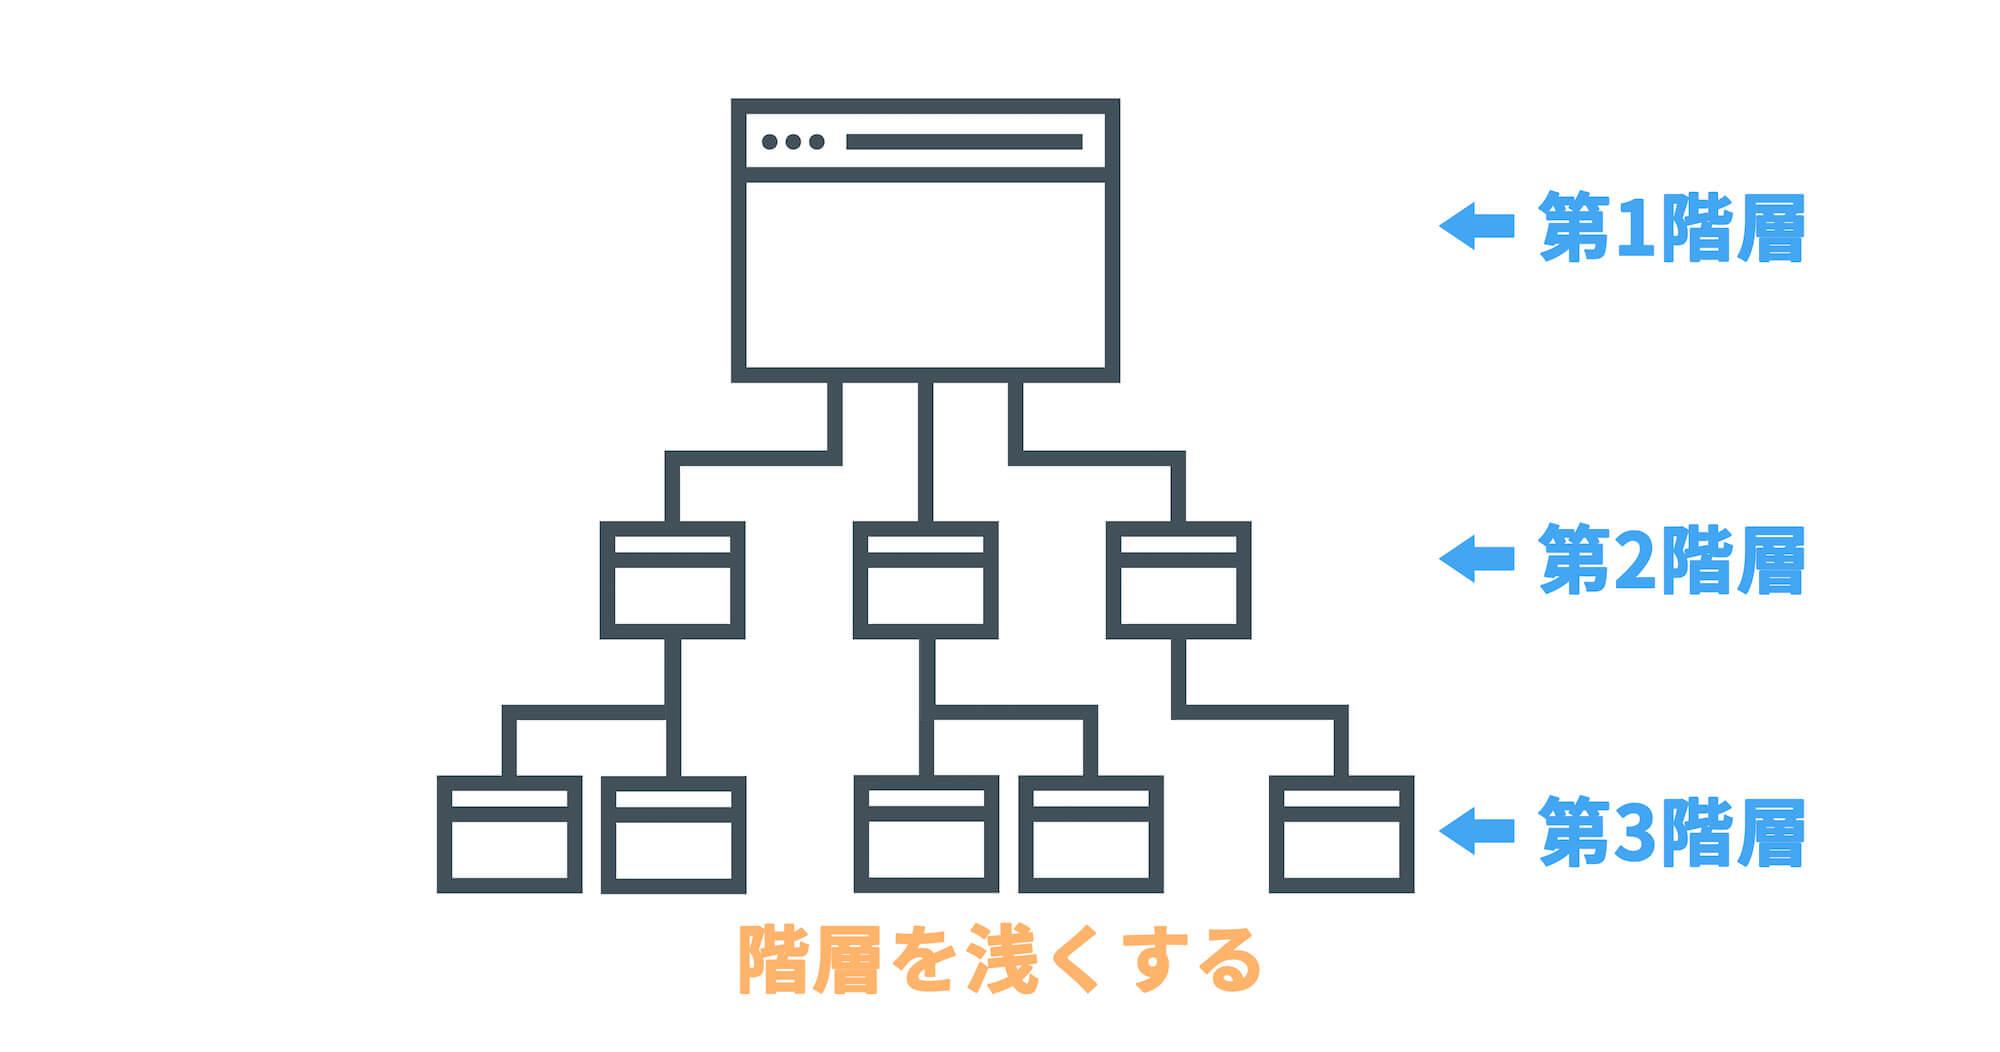 SEOに効果的なサイト設計をするポイントの2つめは階層を浅くすること